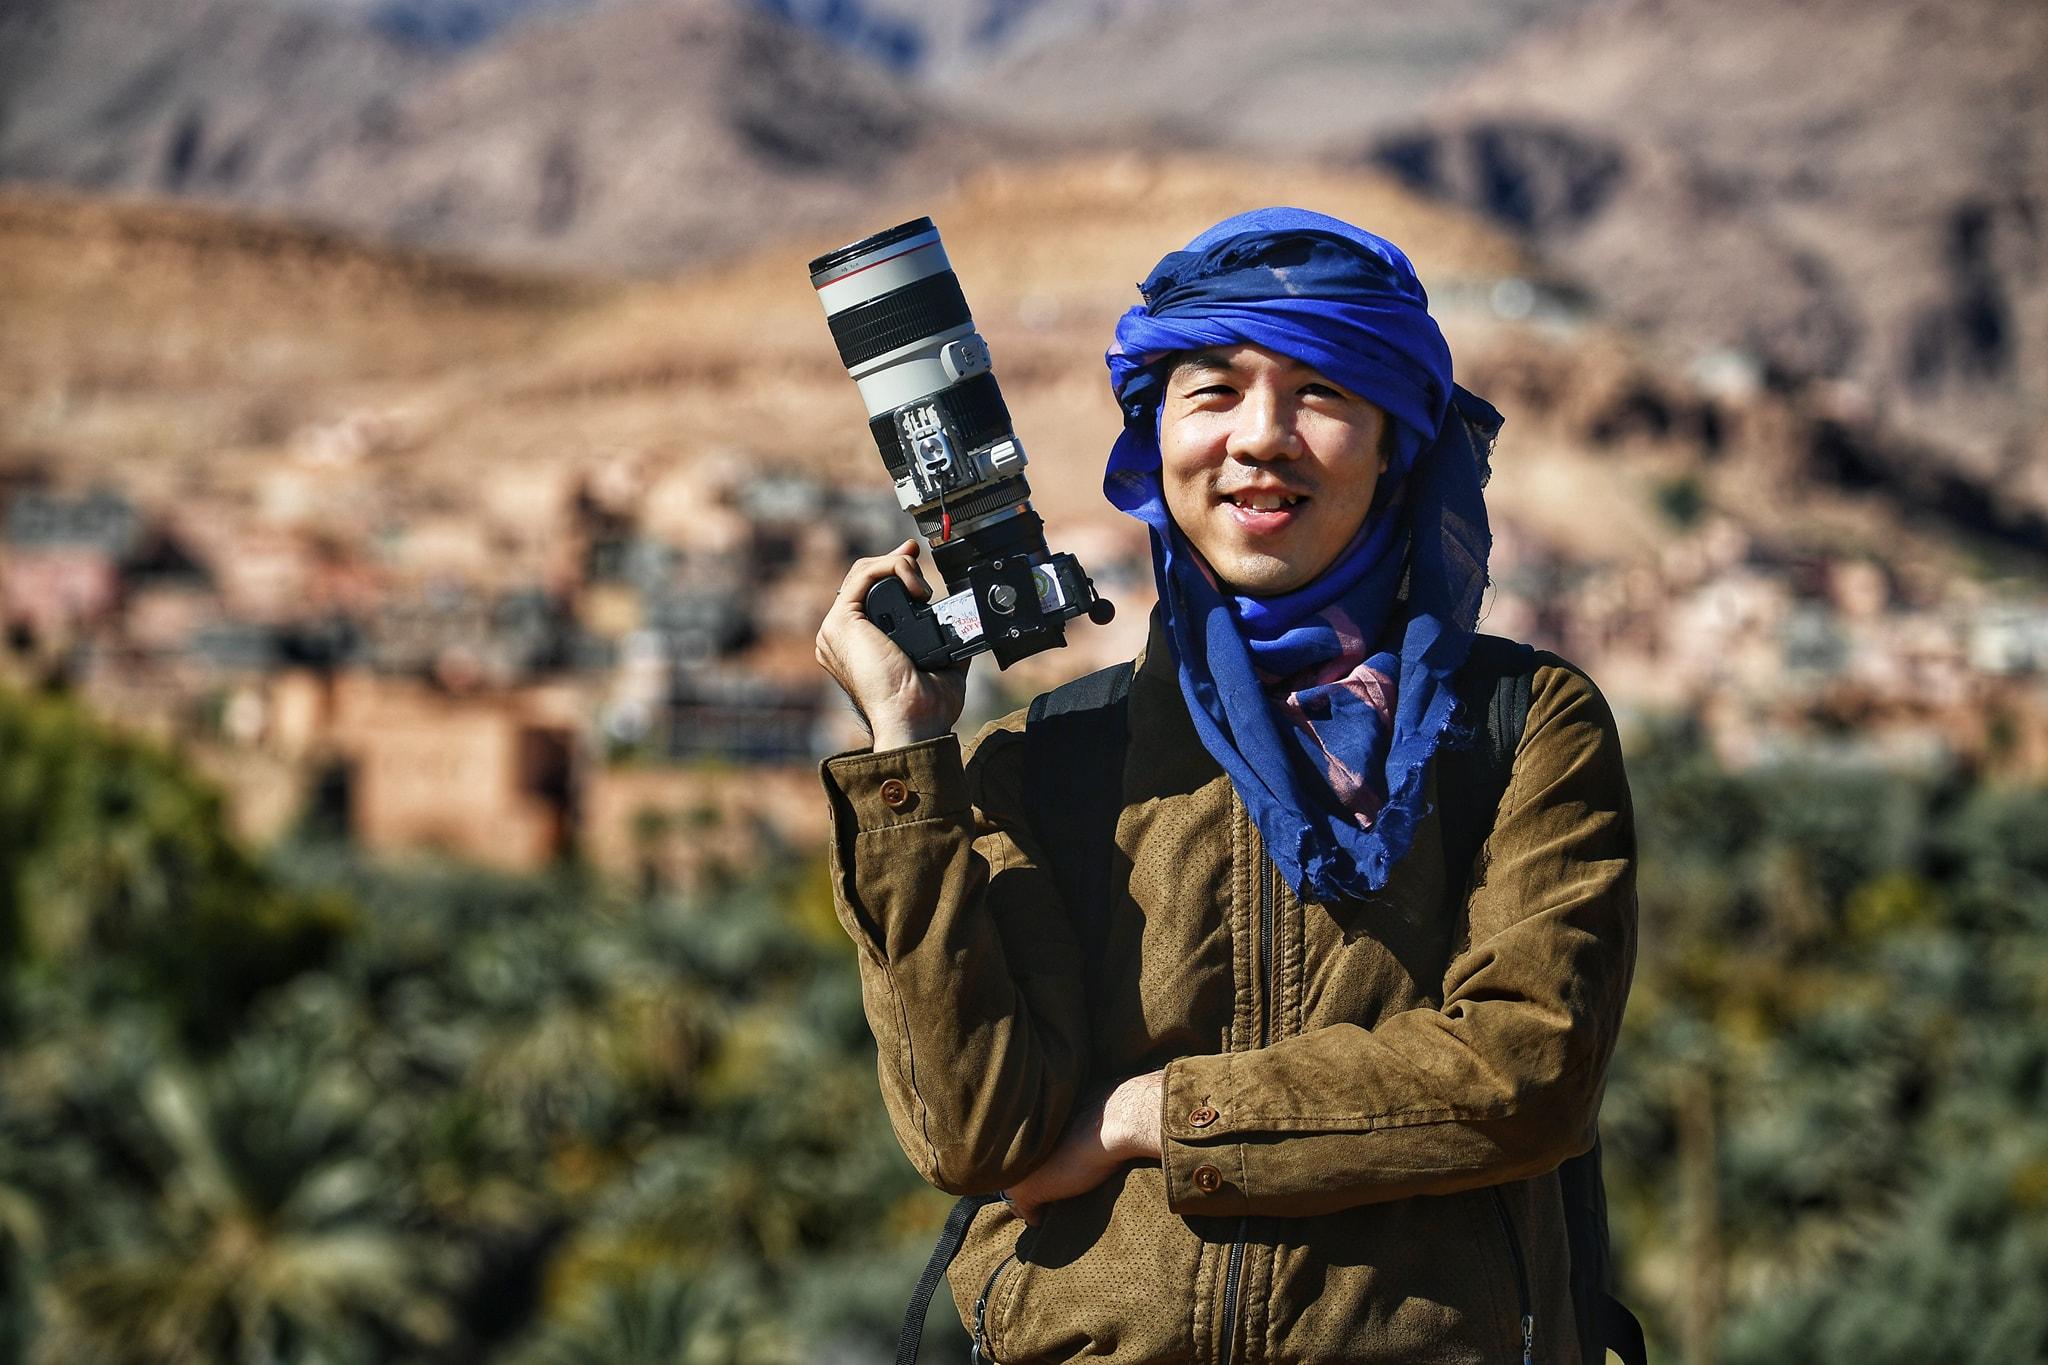 Blogger du lịch Quỷ Cốc Tử